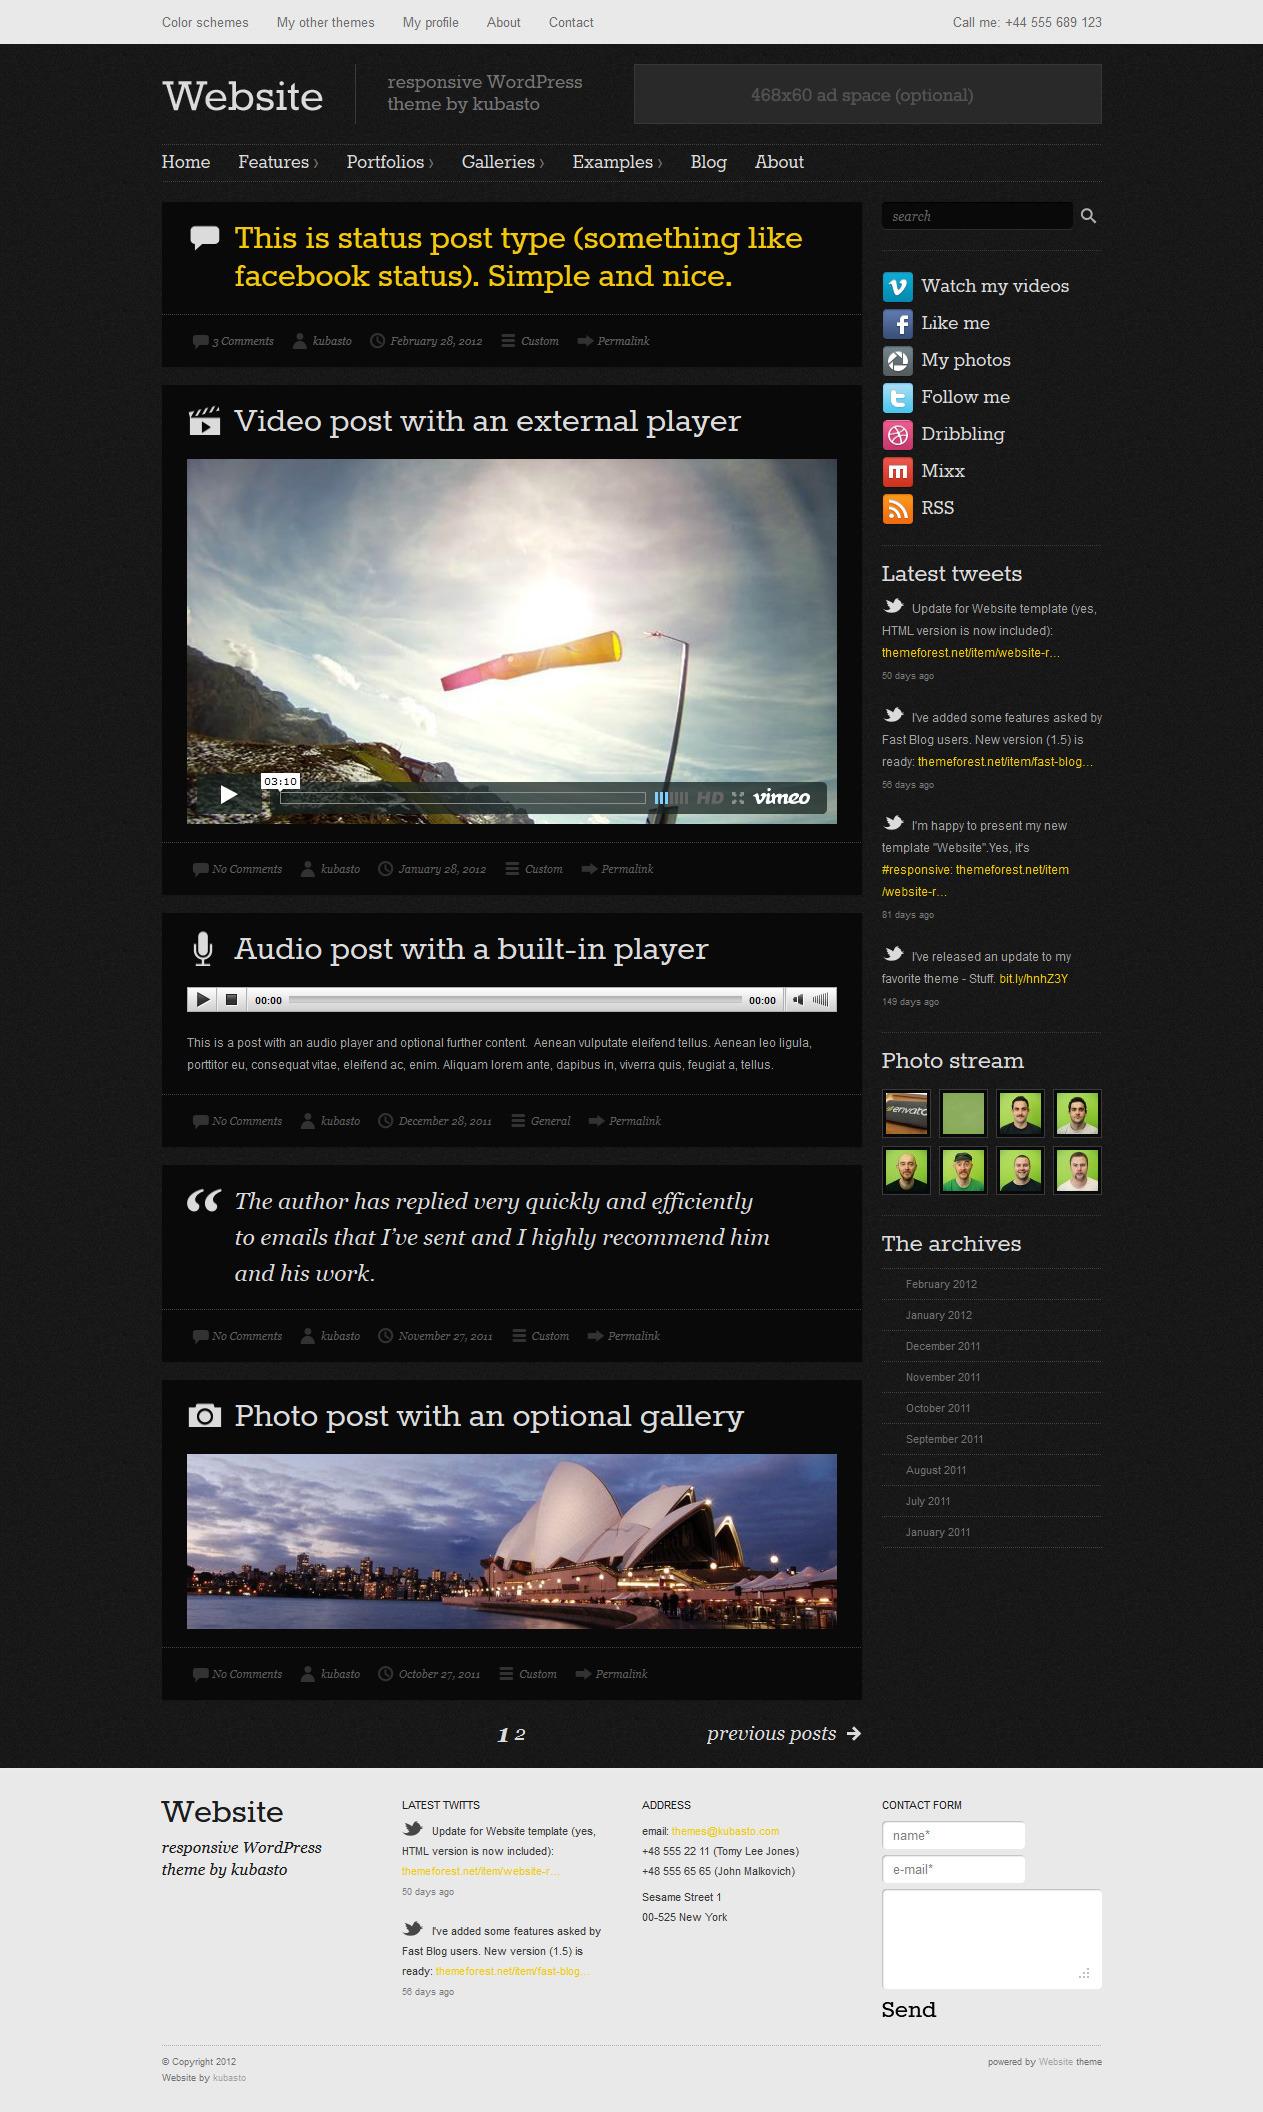 Website - Responsive WordPress Theme